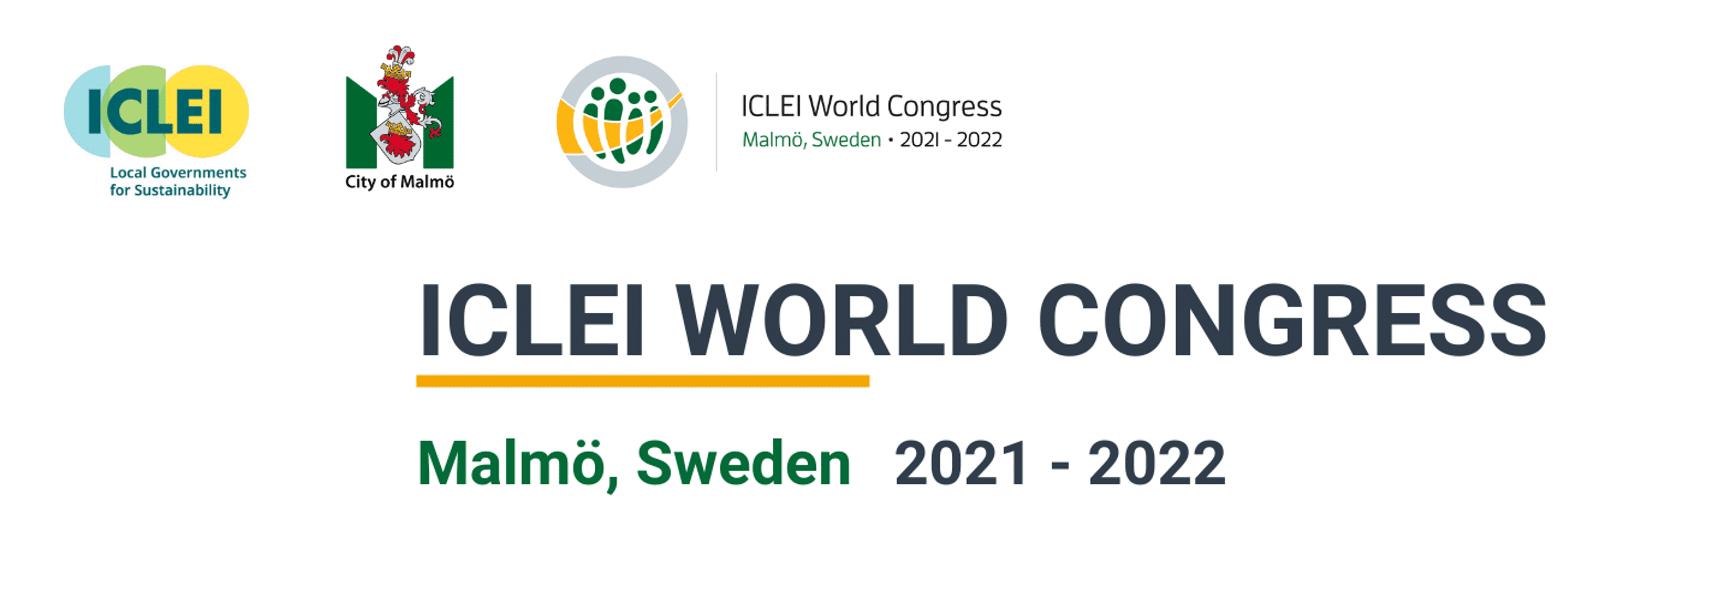 ICLEI World Congress 2021-2022